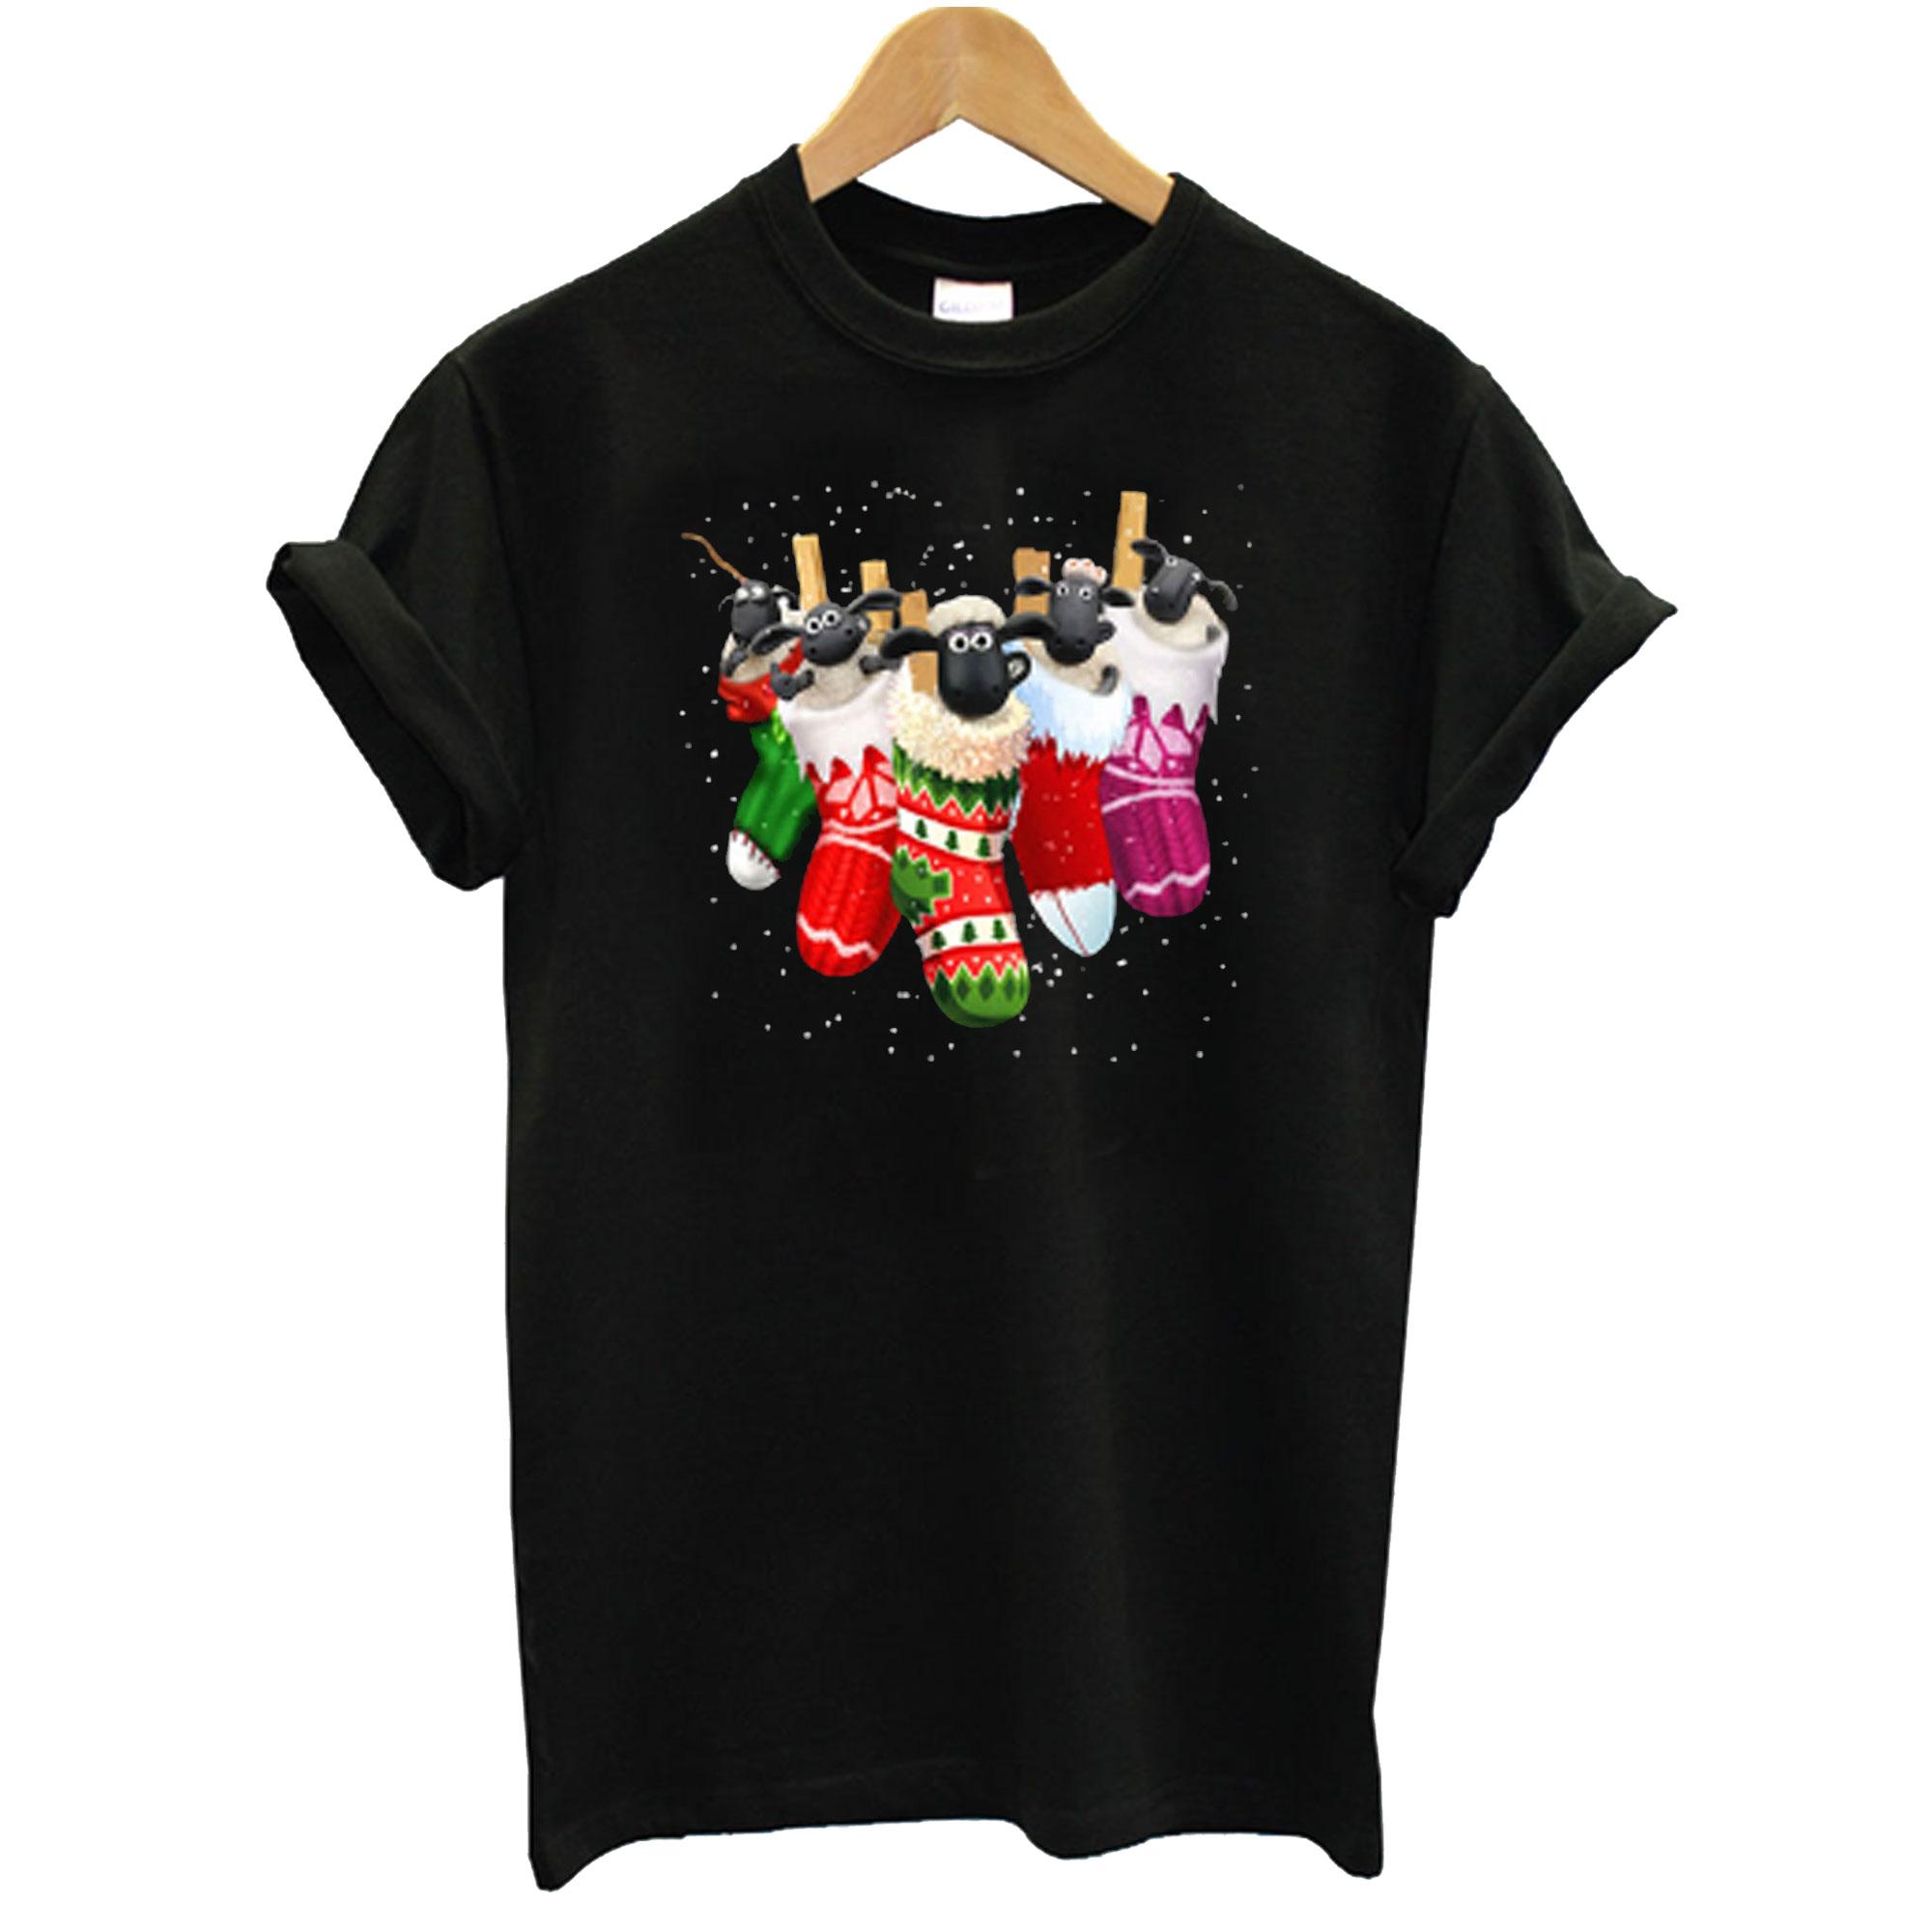 Shaun The Sheep In Socks Christmas T-Shirt